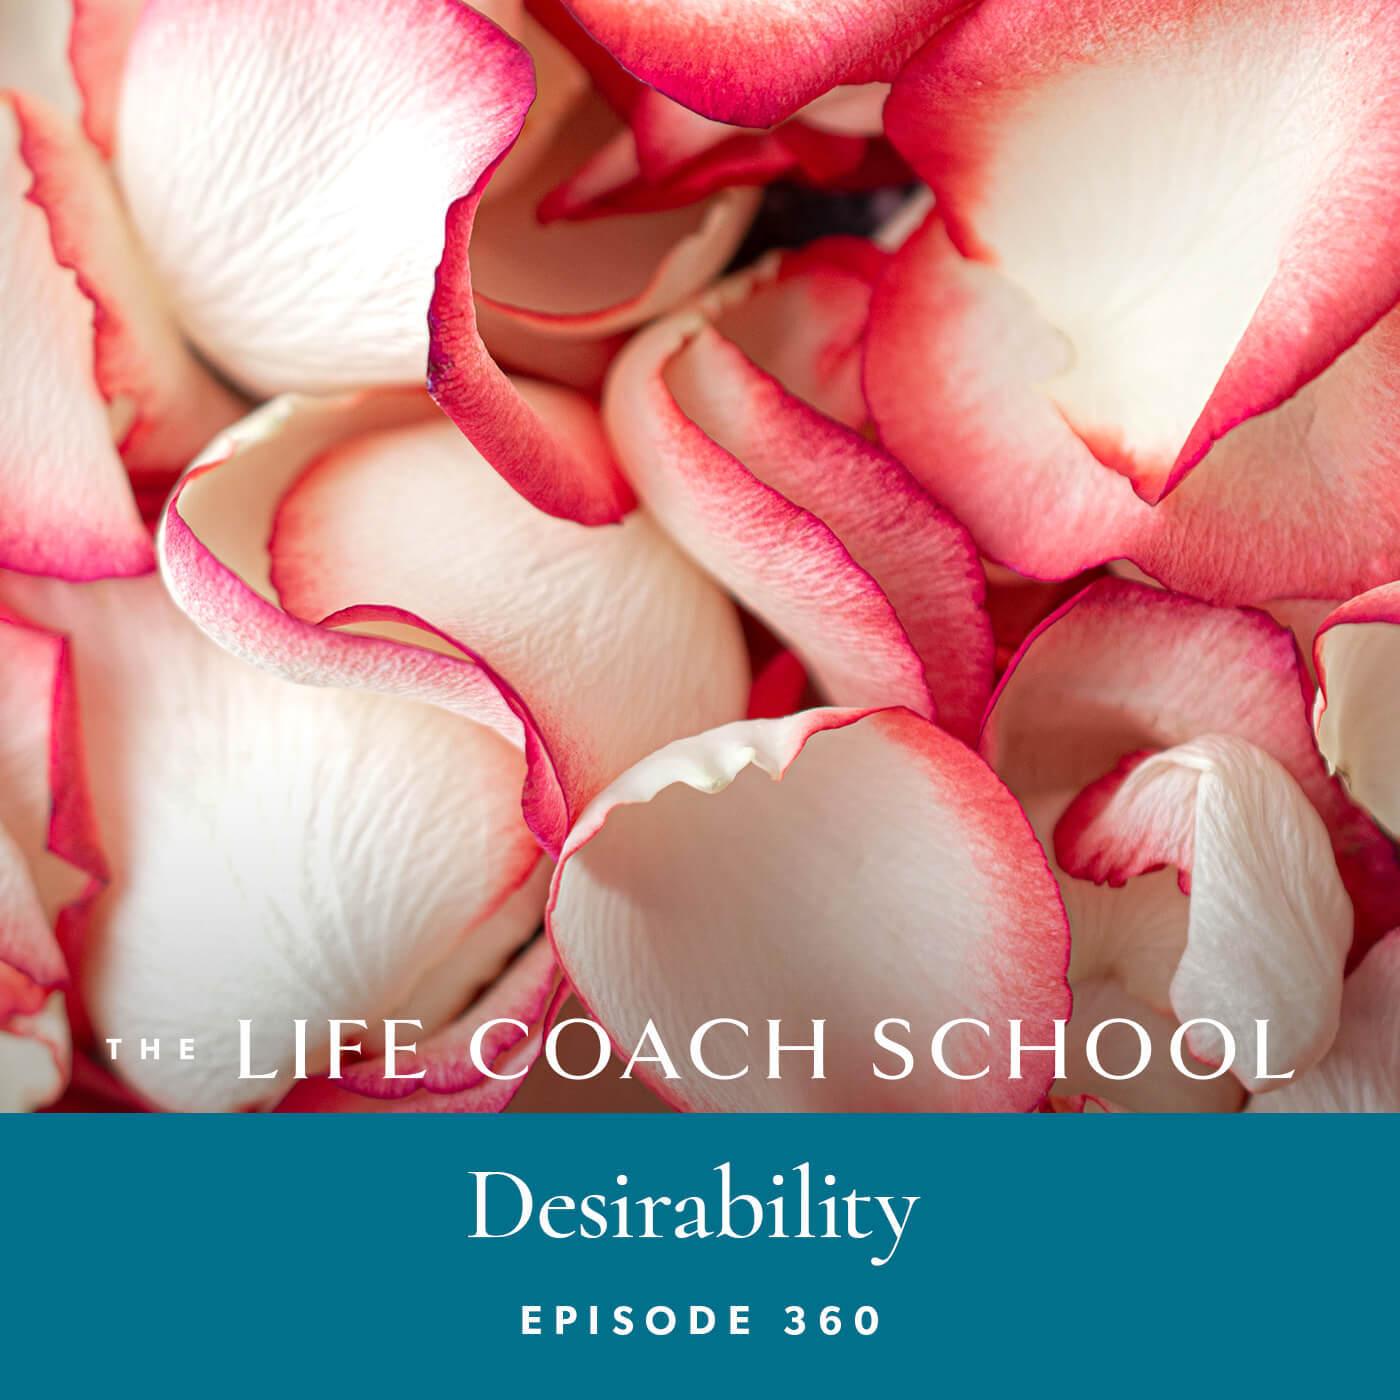 The Life Coach School Podcast with Brooke Castillo   Desirability